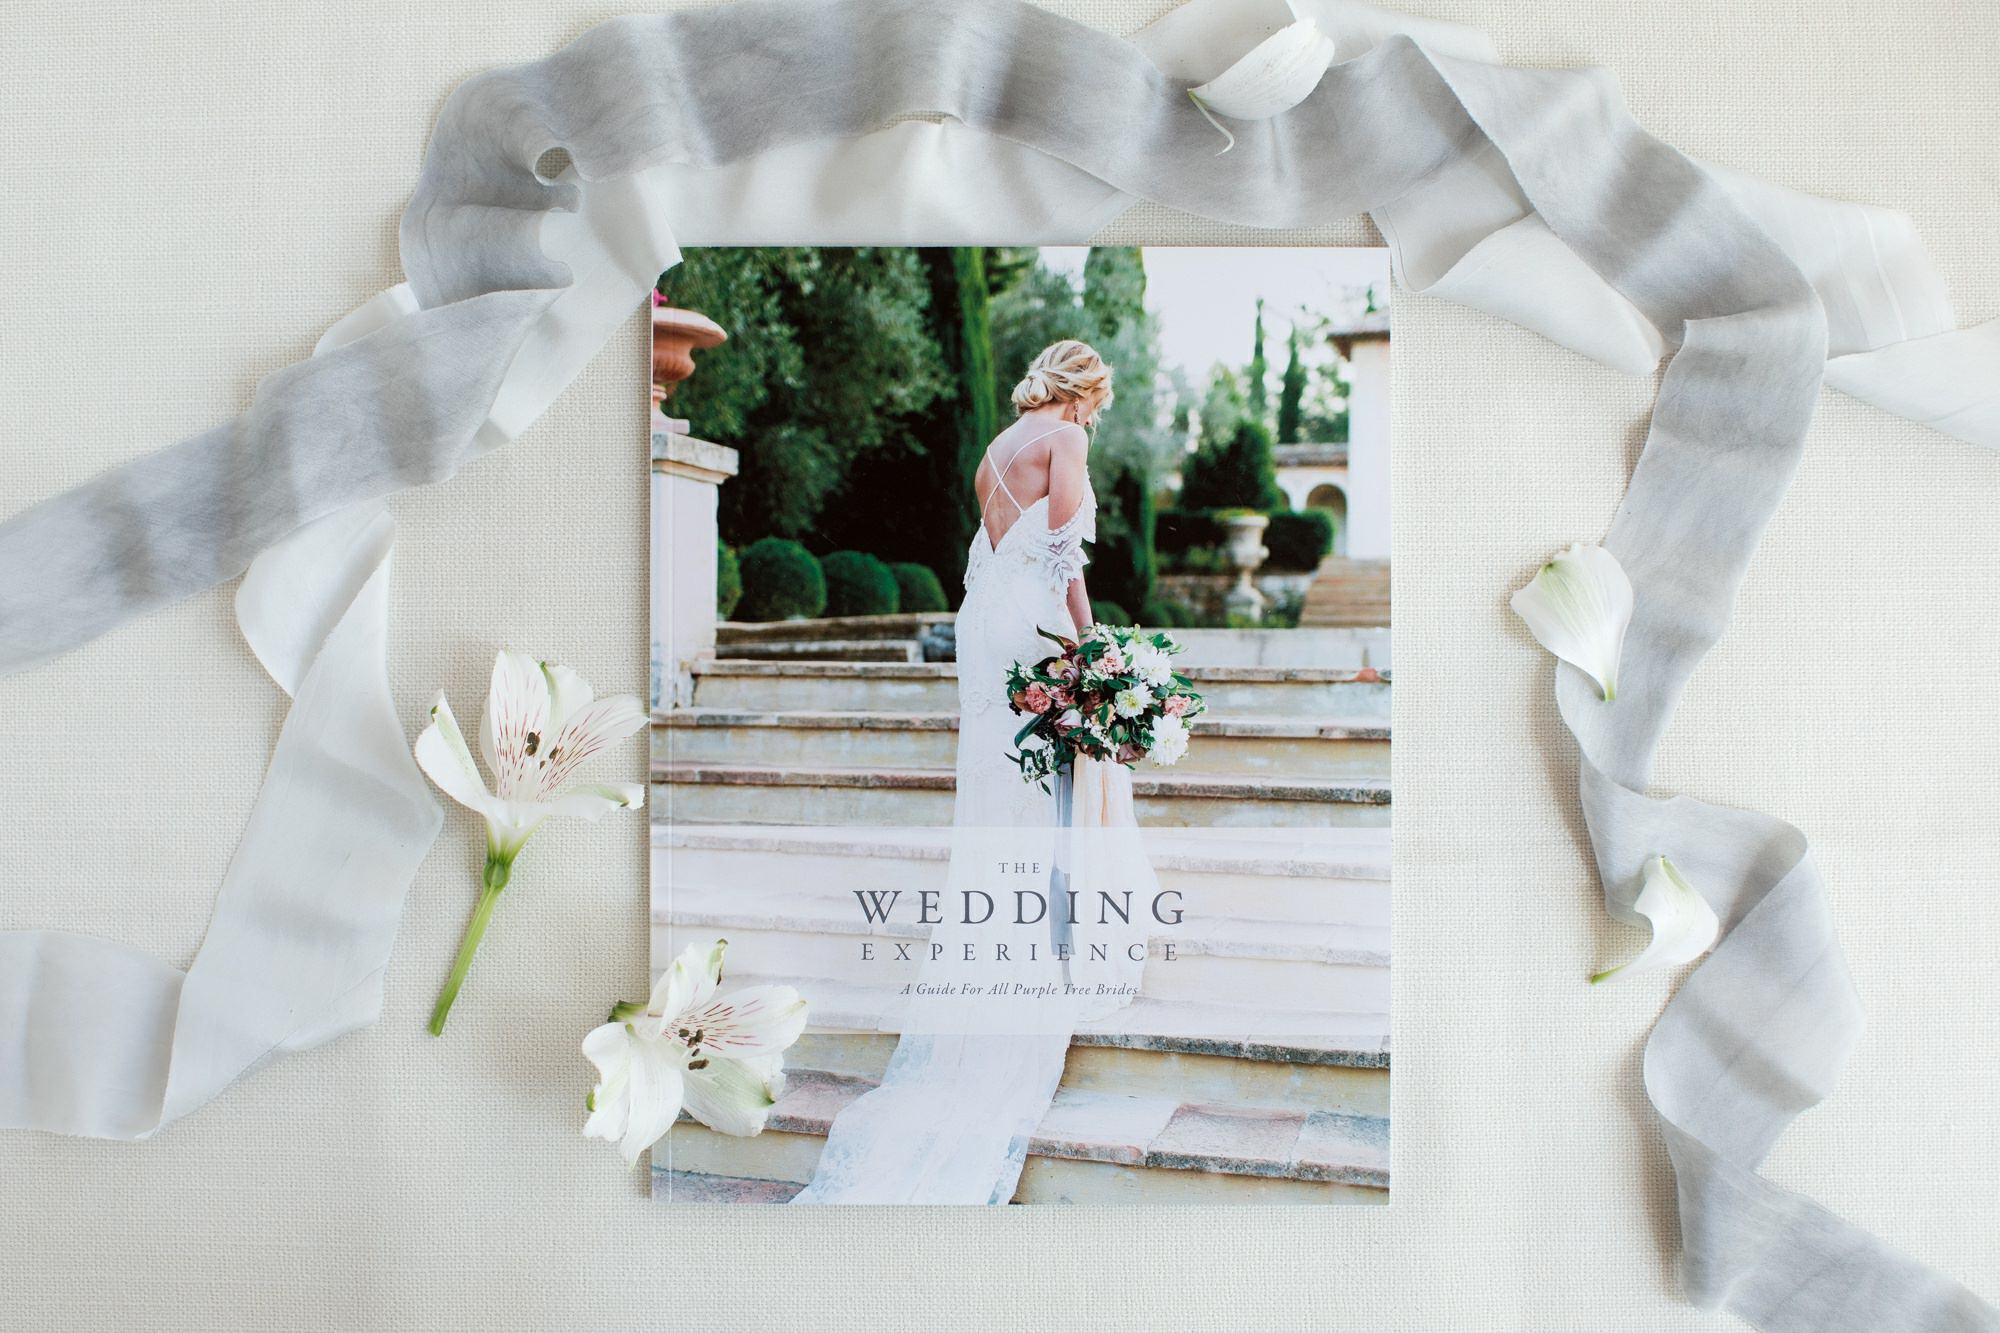 Wedding Experience Magazine